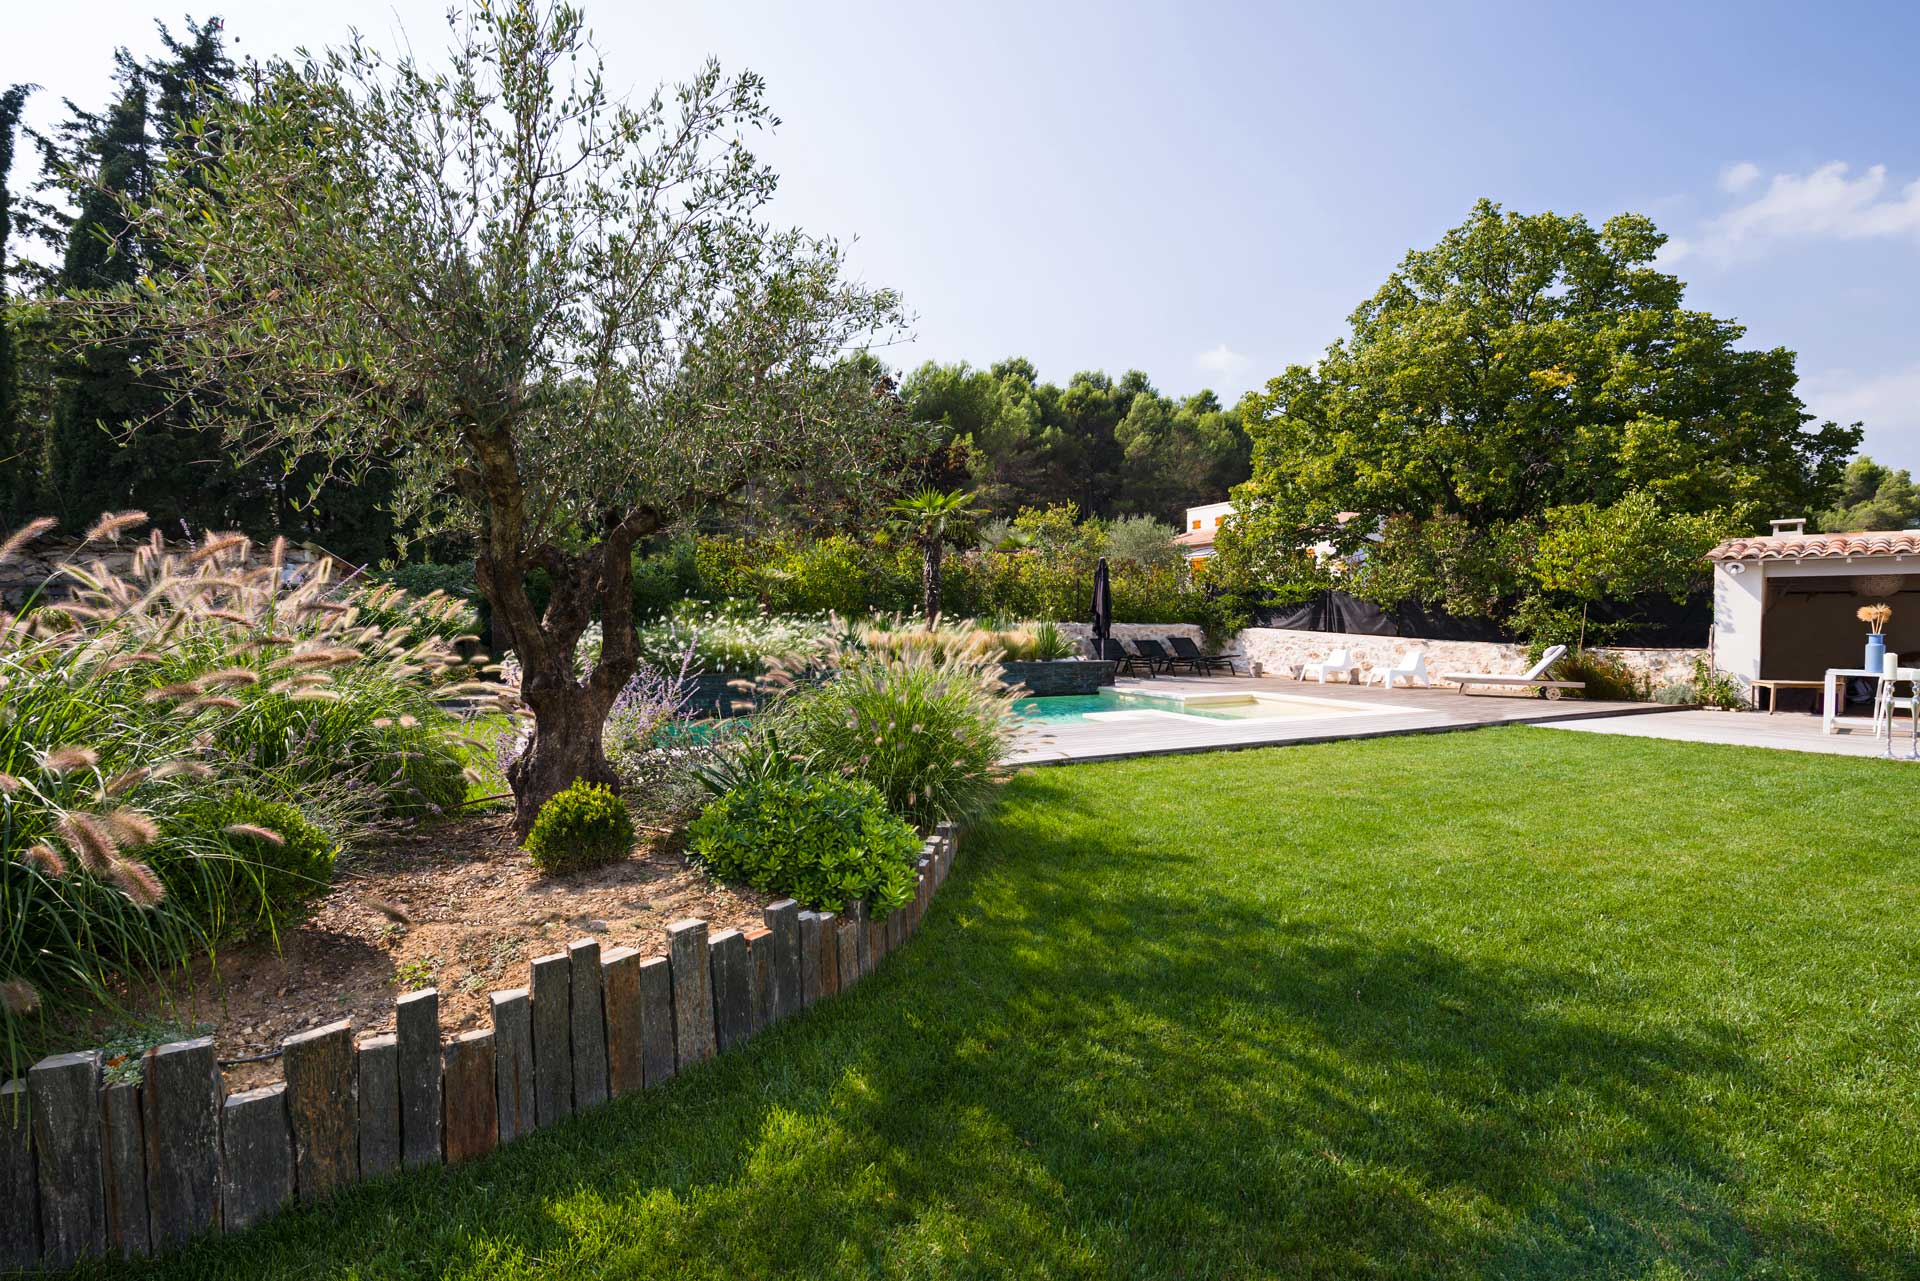 Jardin Provençal D'Inspiration Contemporaine - Morvant destiné Jardin De Provence